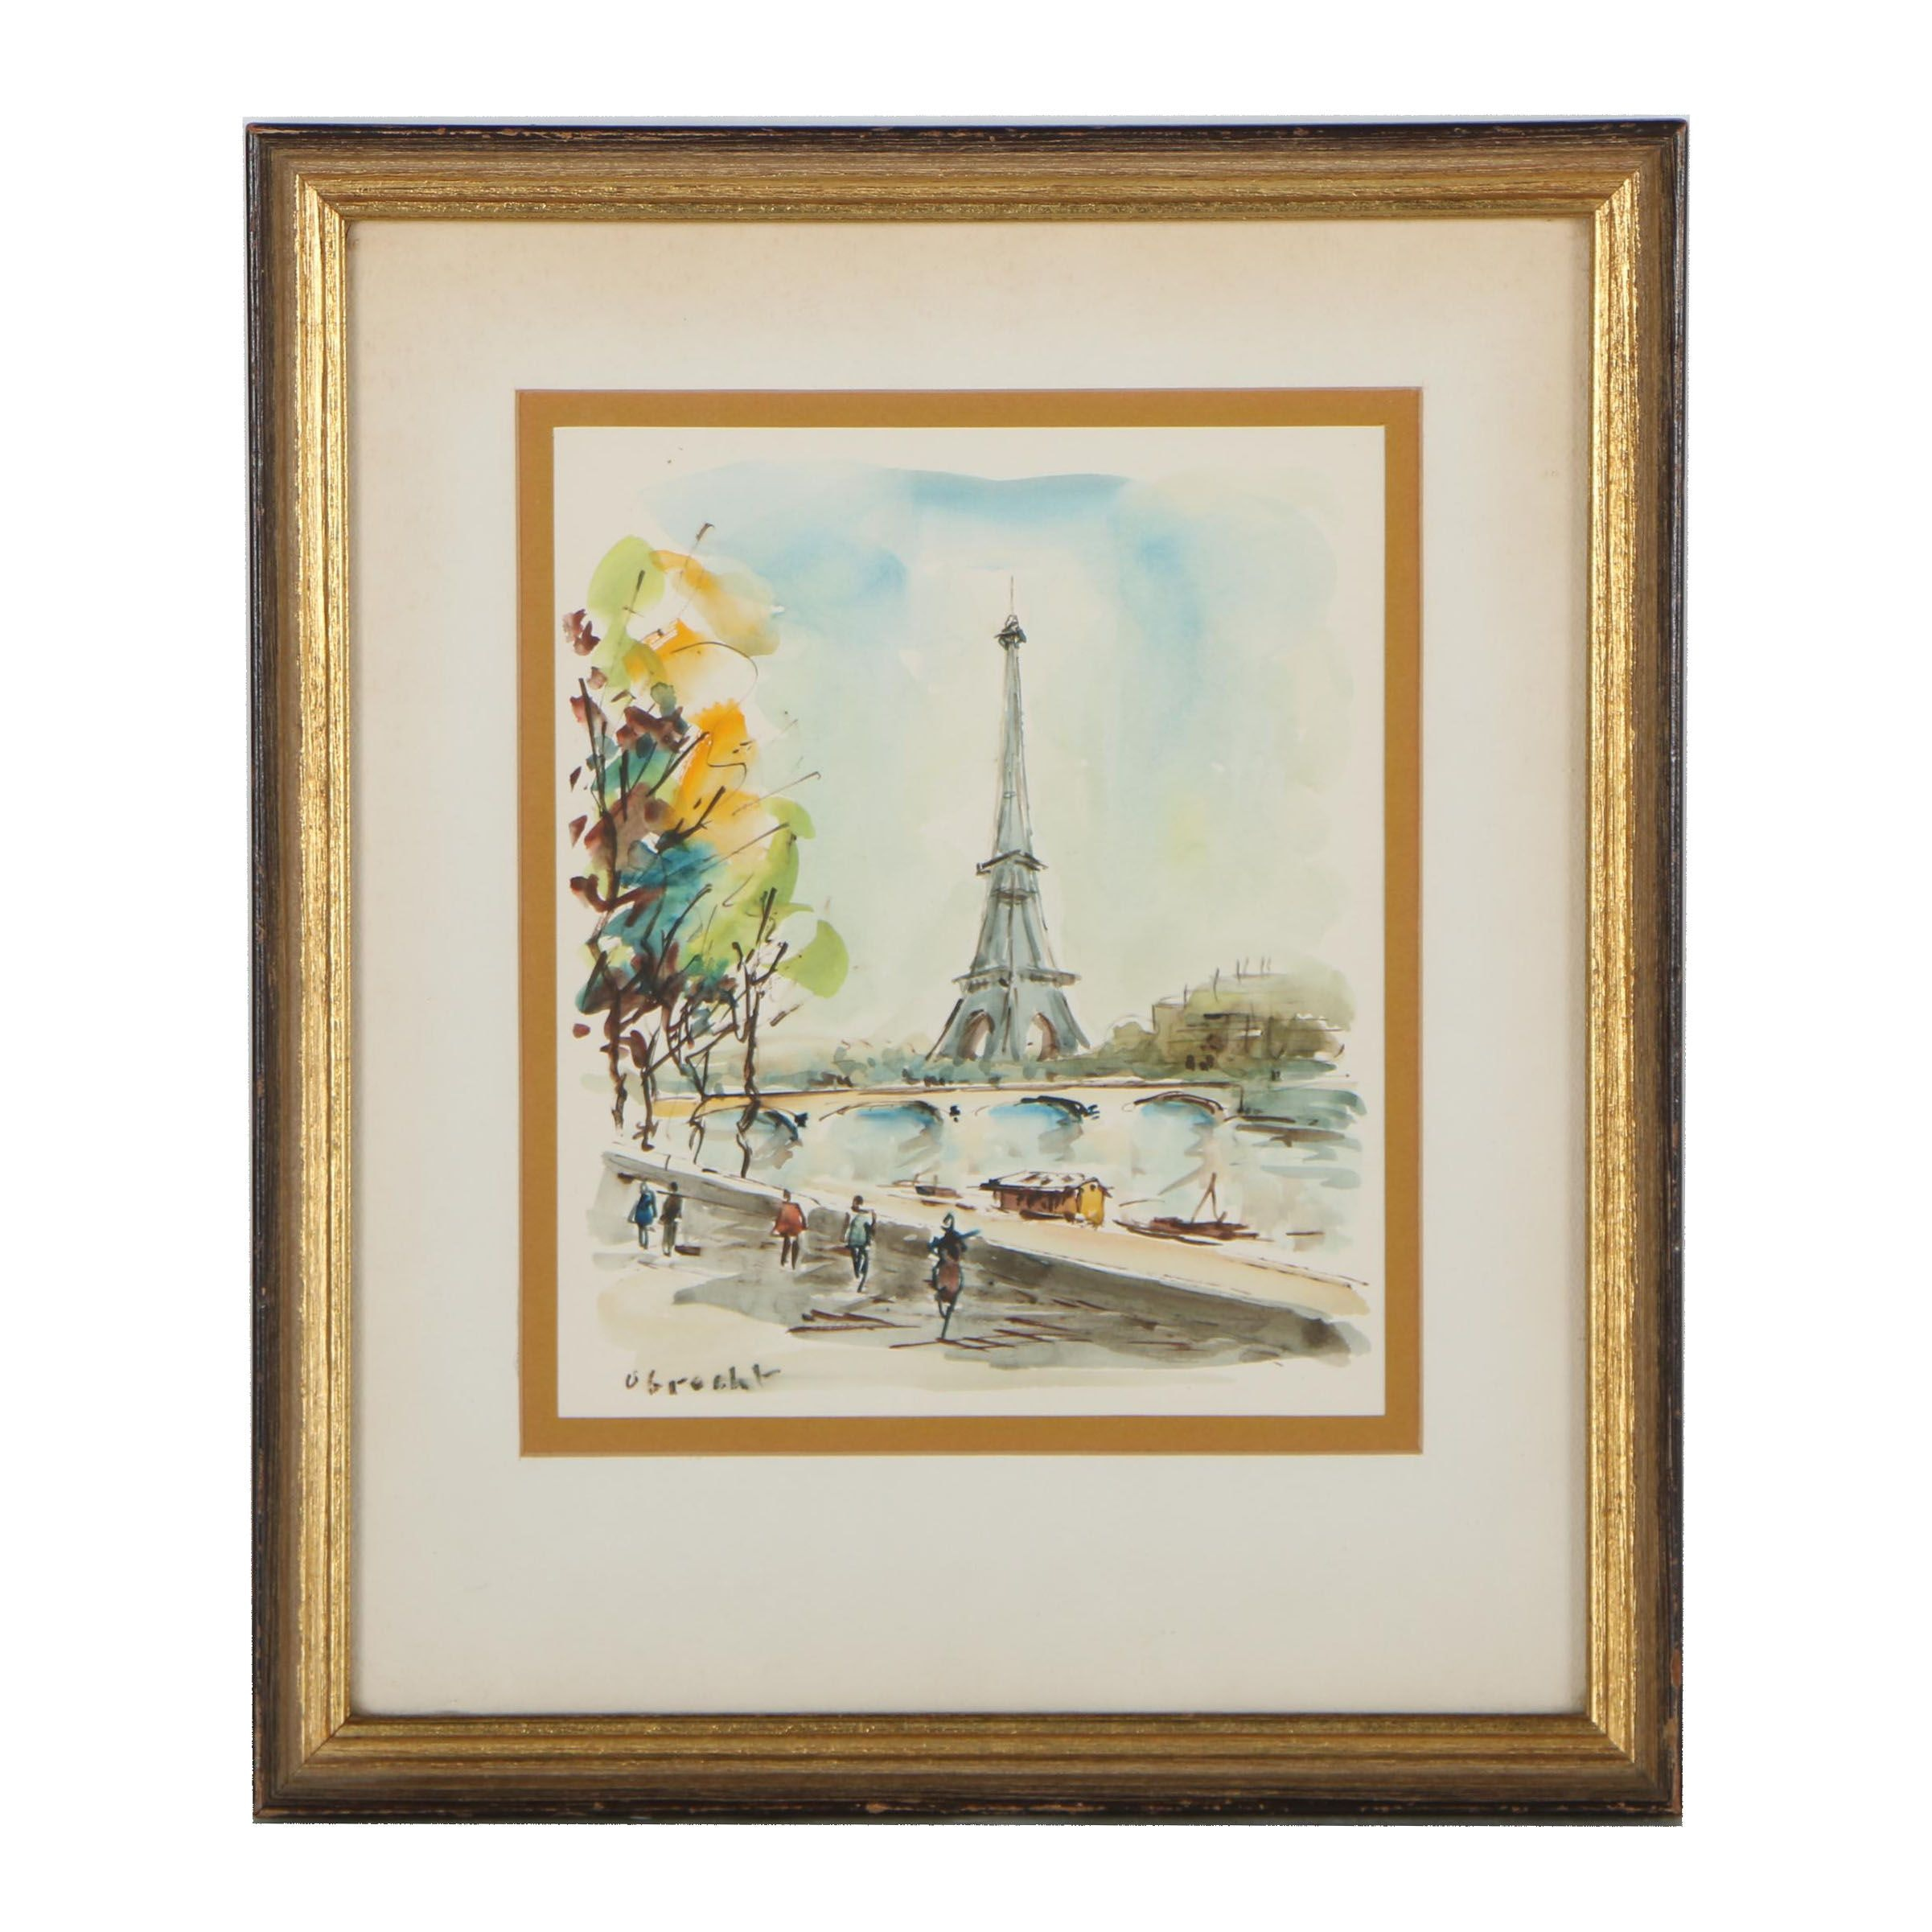 Obrecht Watercolor Painting of Paris Street